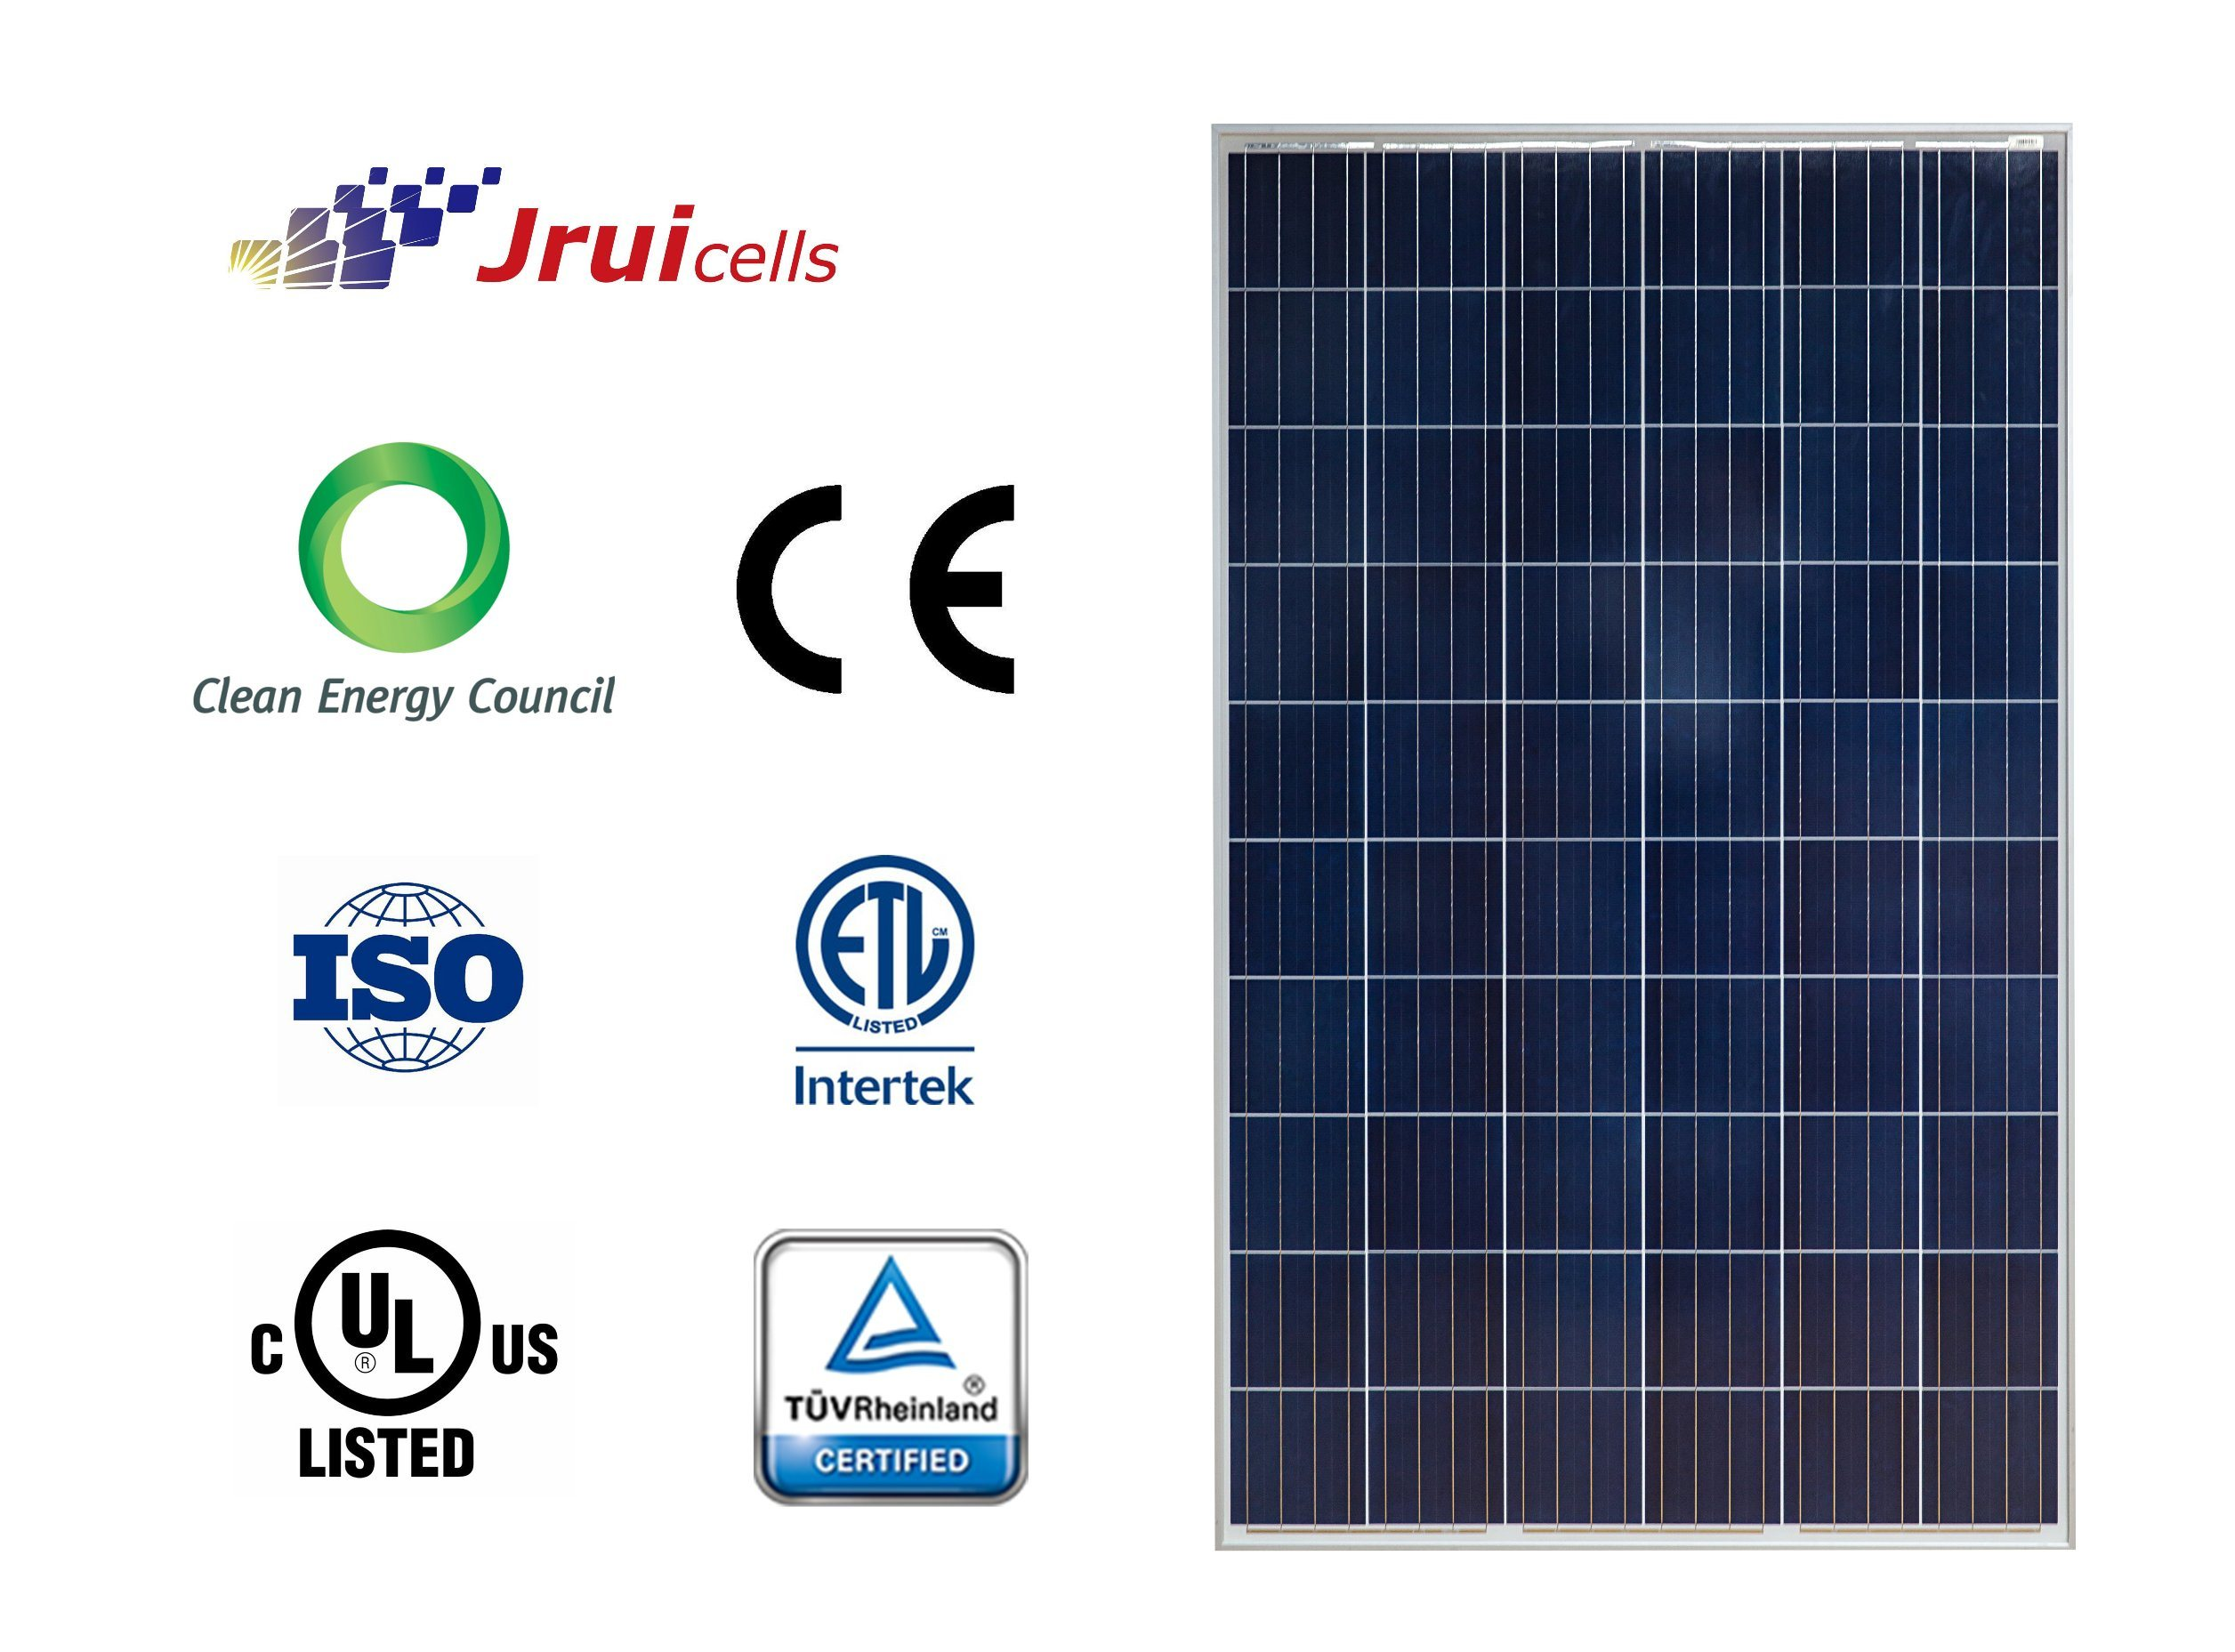 Salt Mist Resistant 270W Polycrystalline Silicon Solar Panel